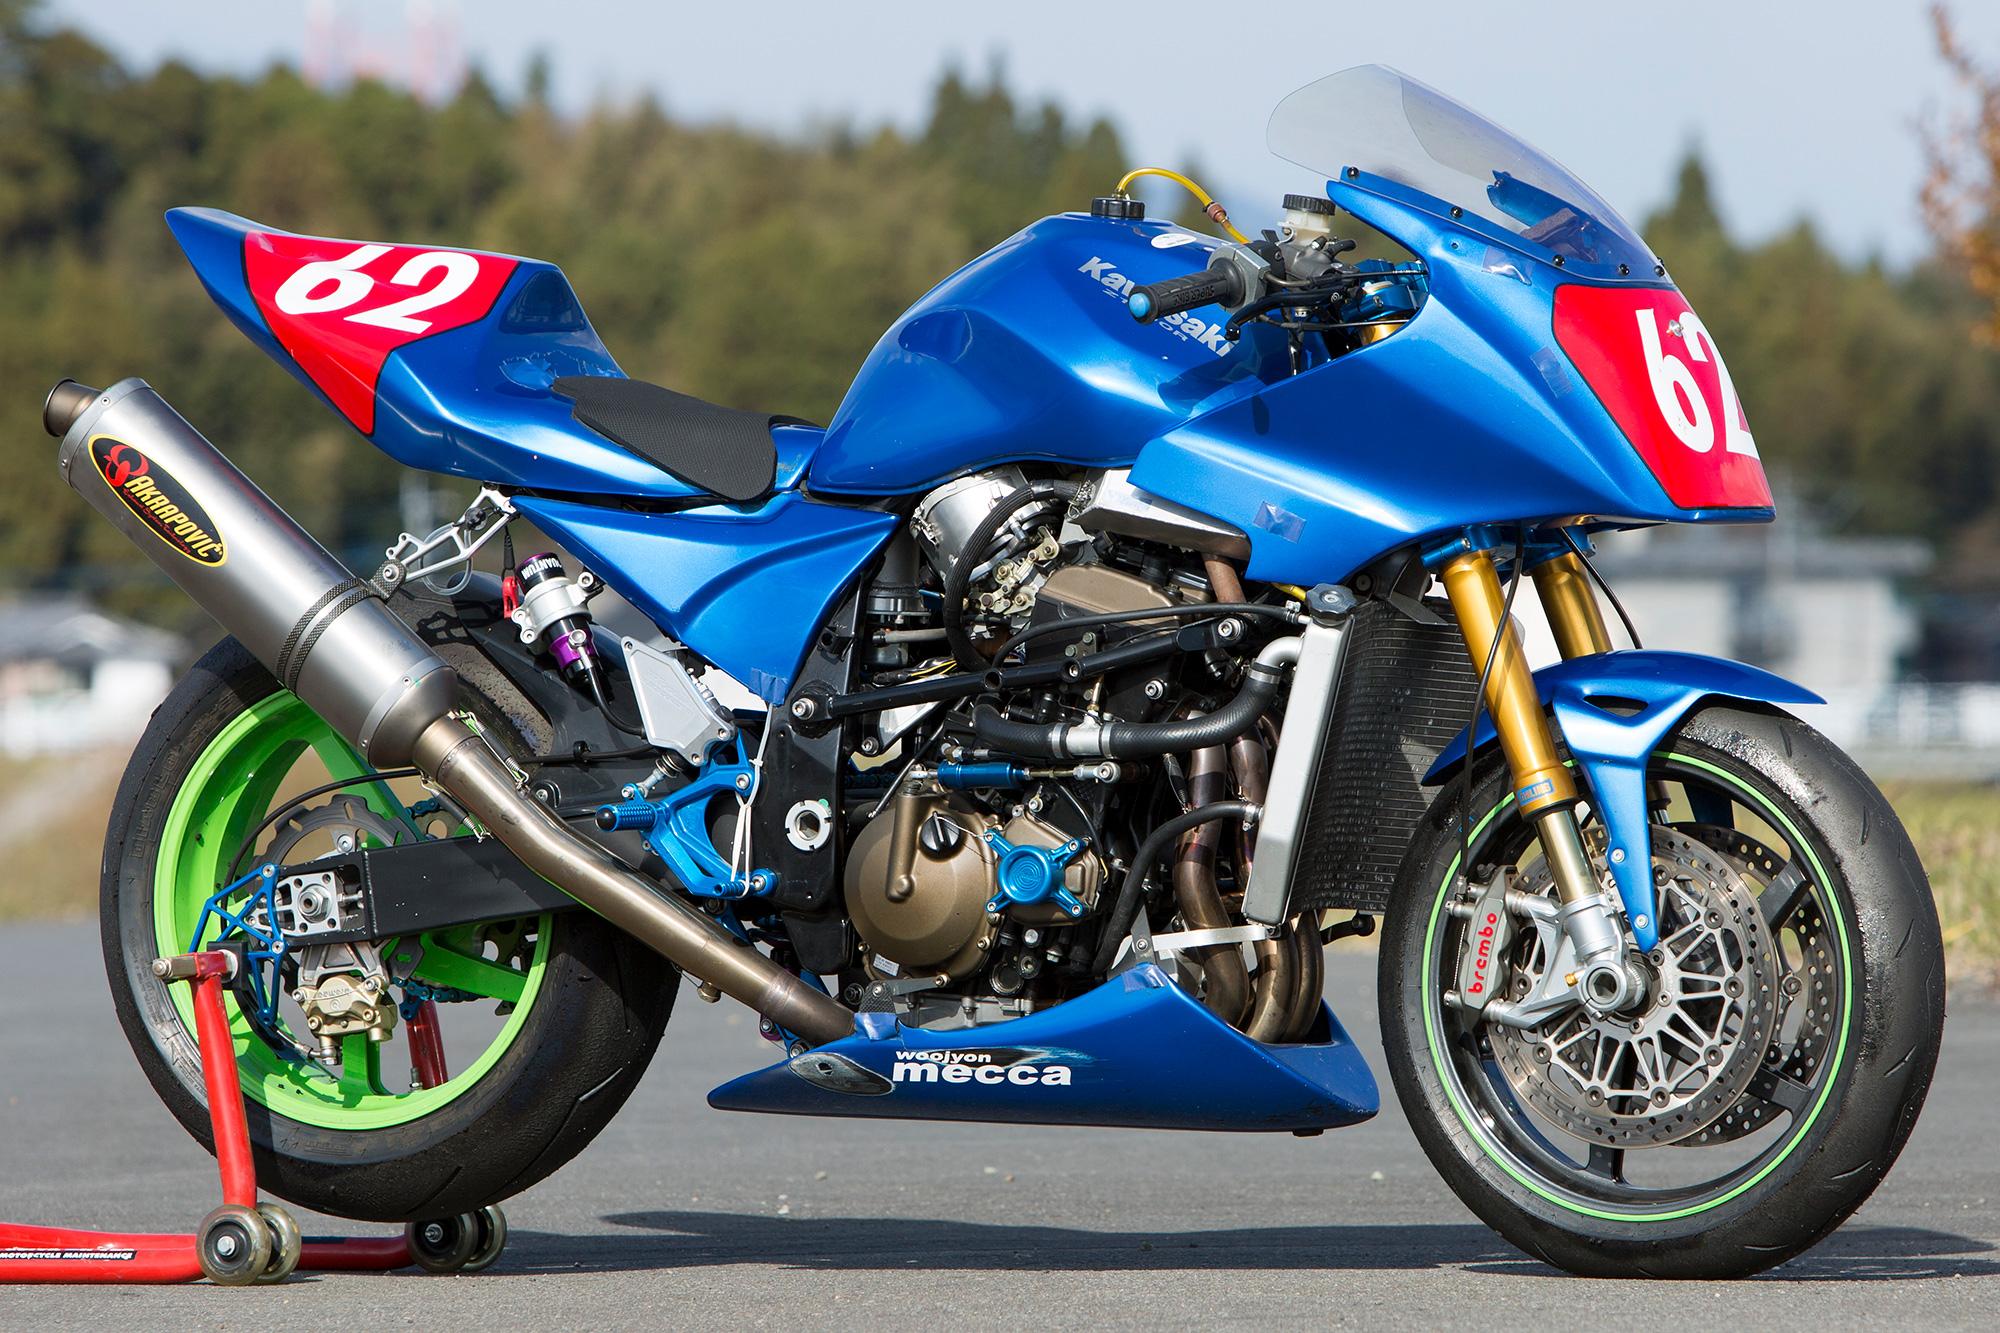 Z1000 by ウィリー